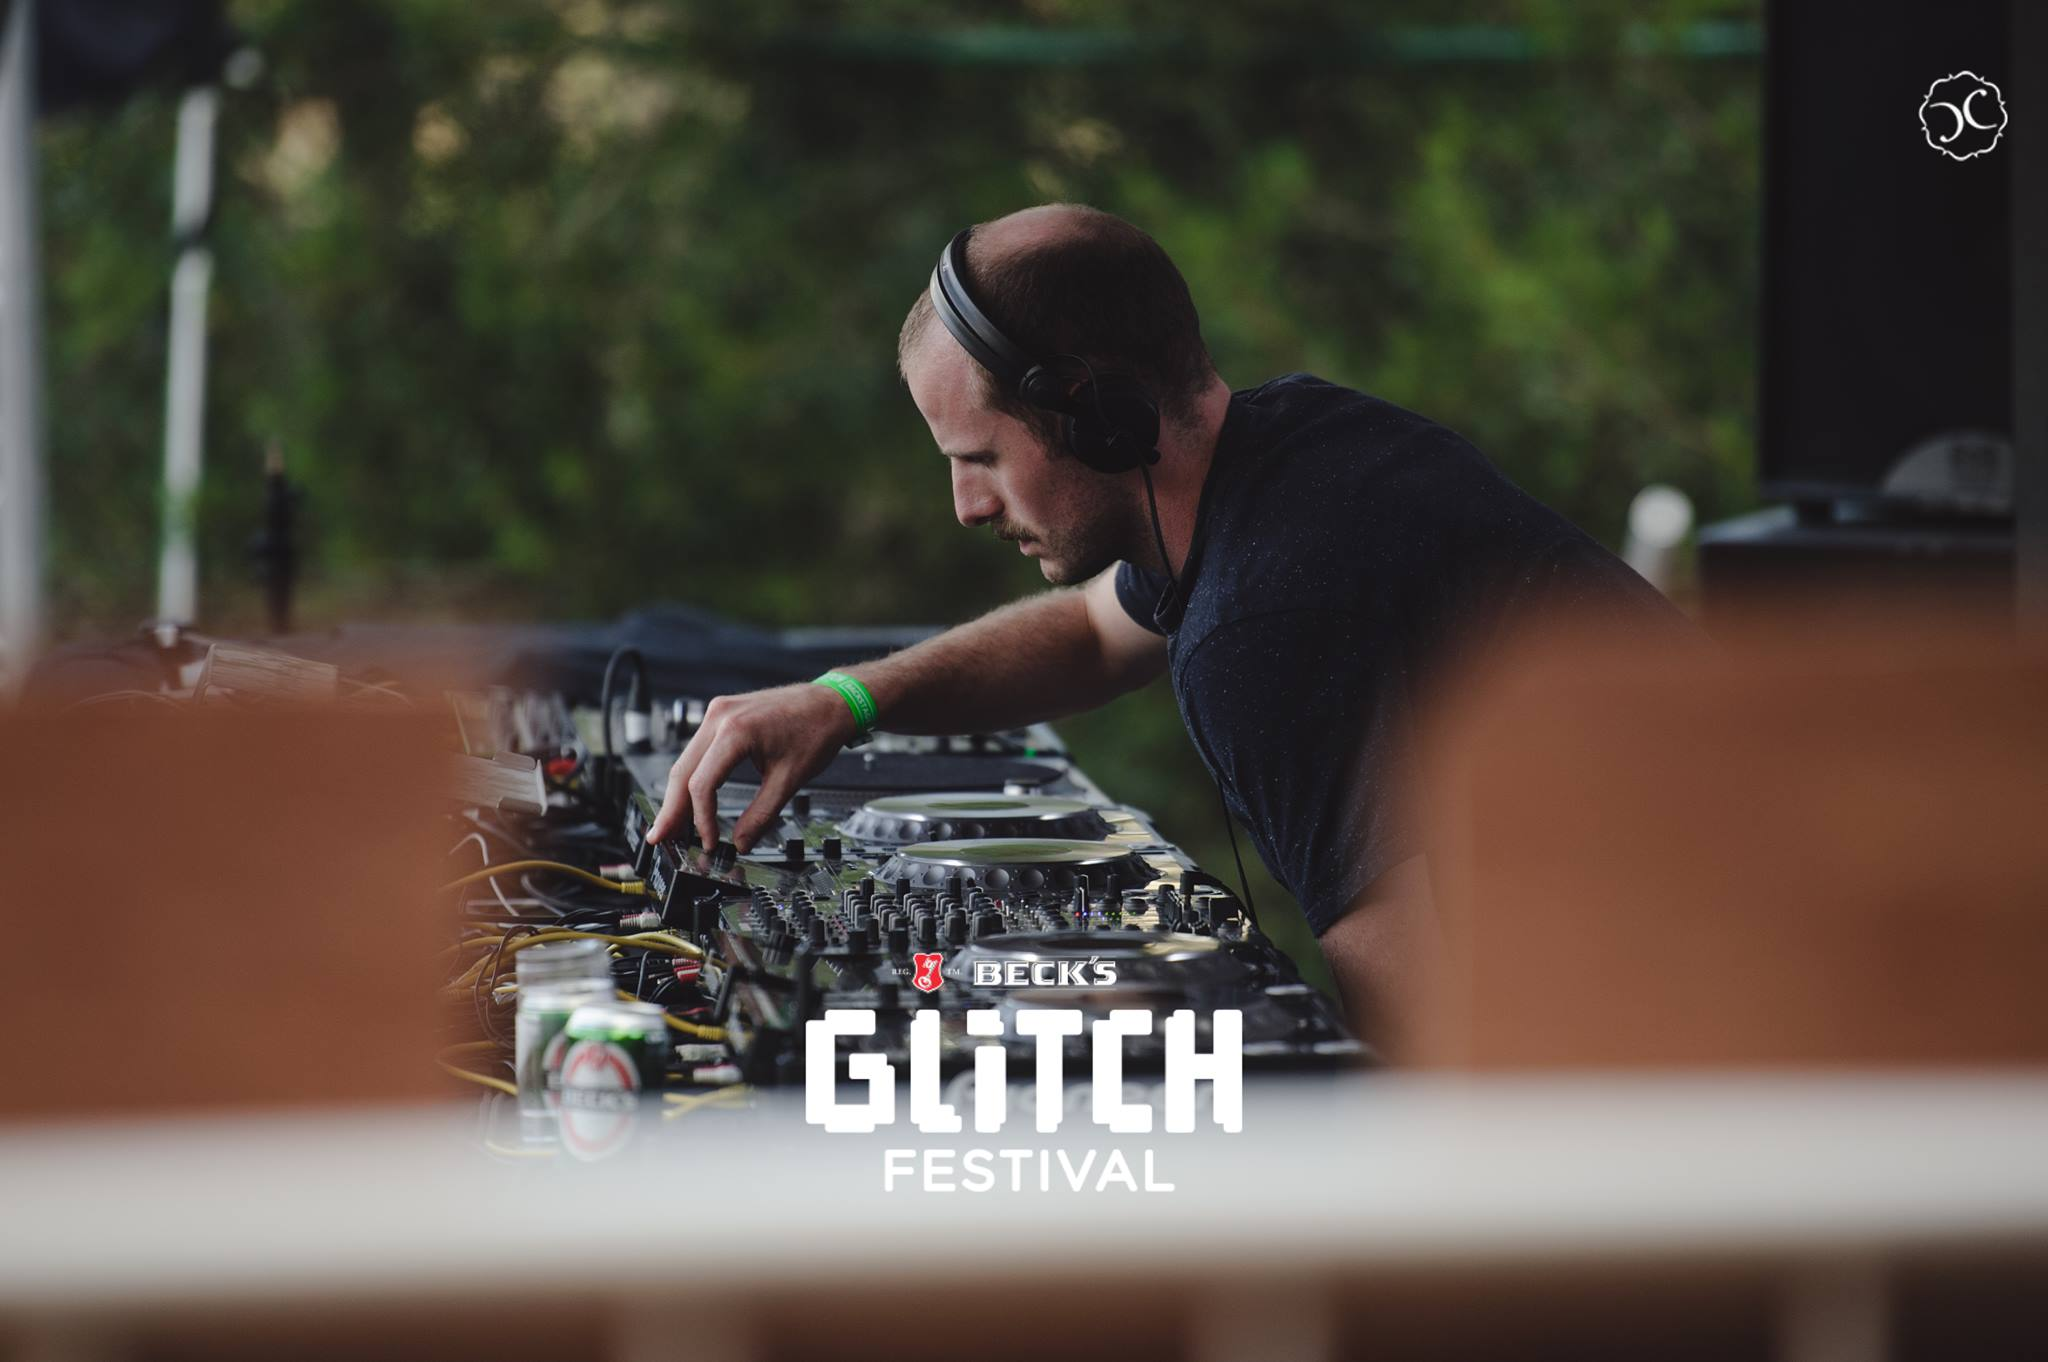 midland glitch festival malta